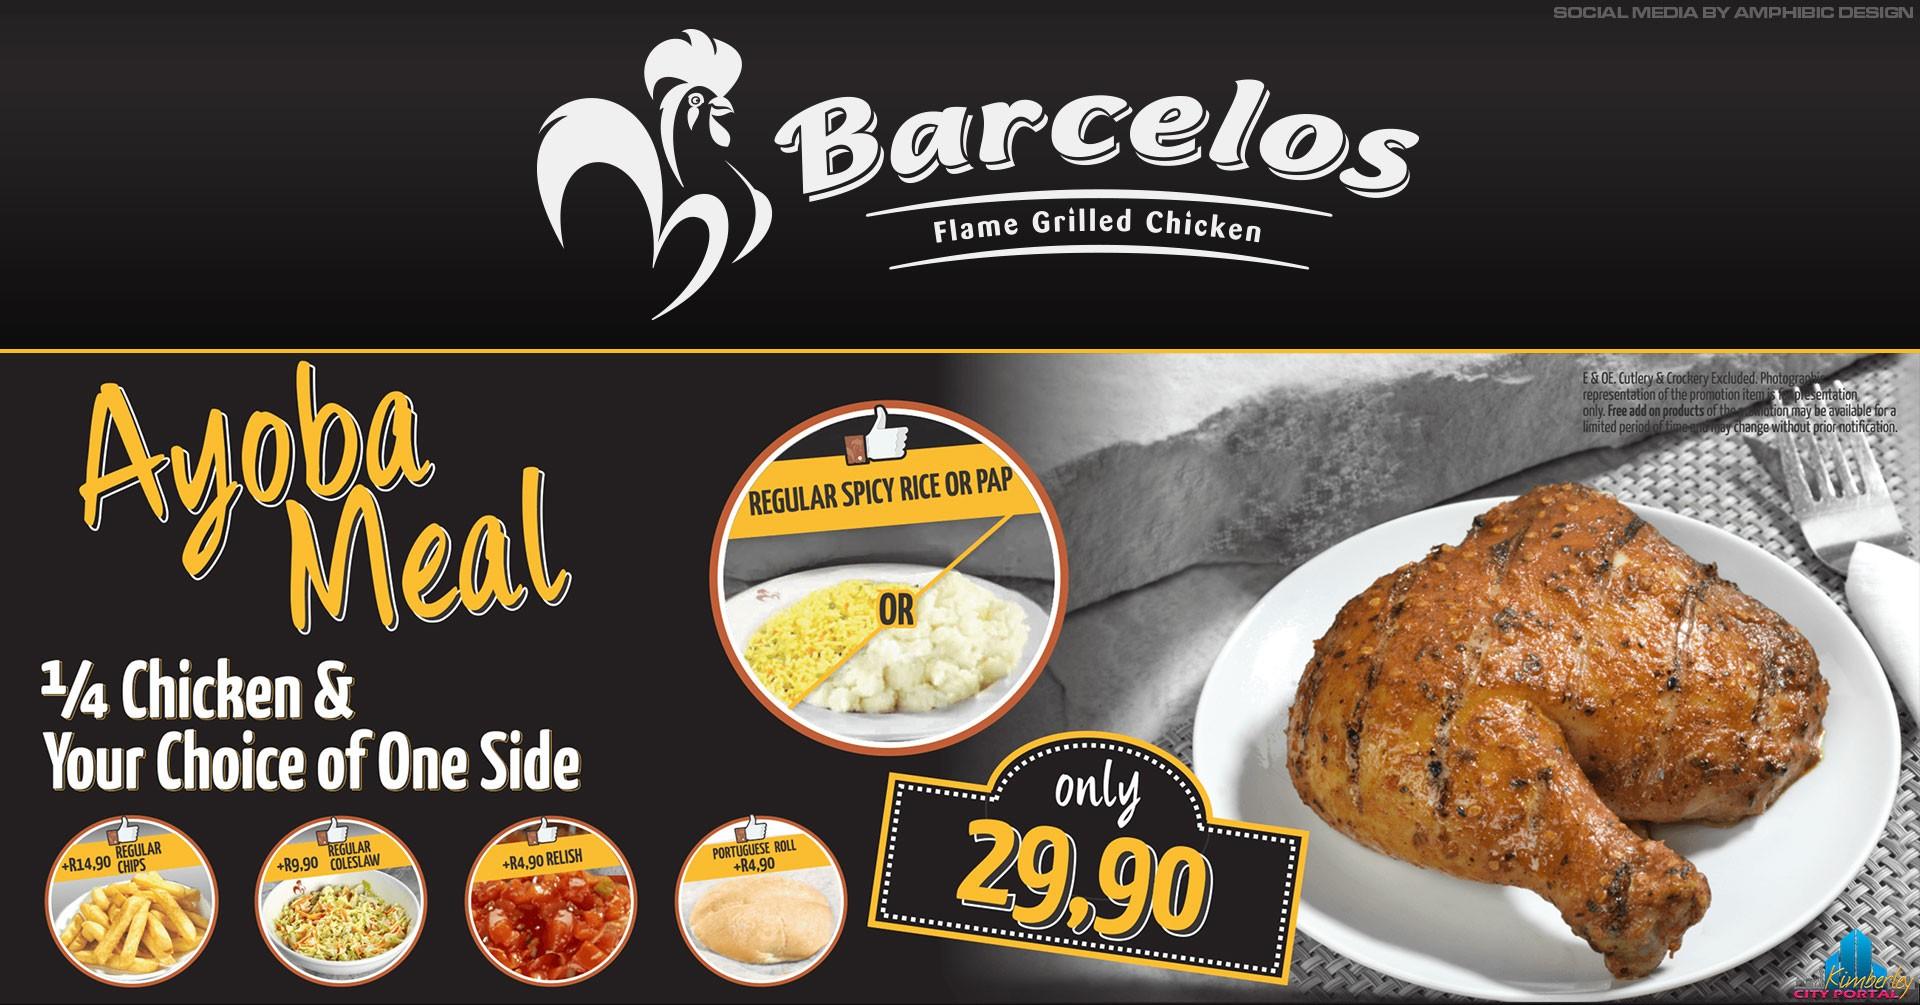 BARCELOS_Ayoba_Meal_Special-KCP-SP-201908-v1_00a